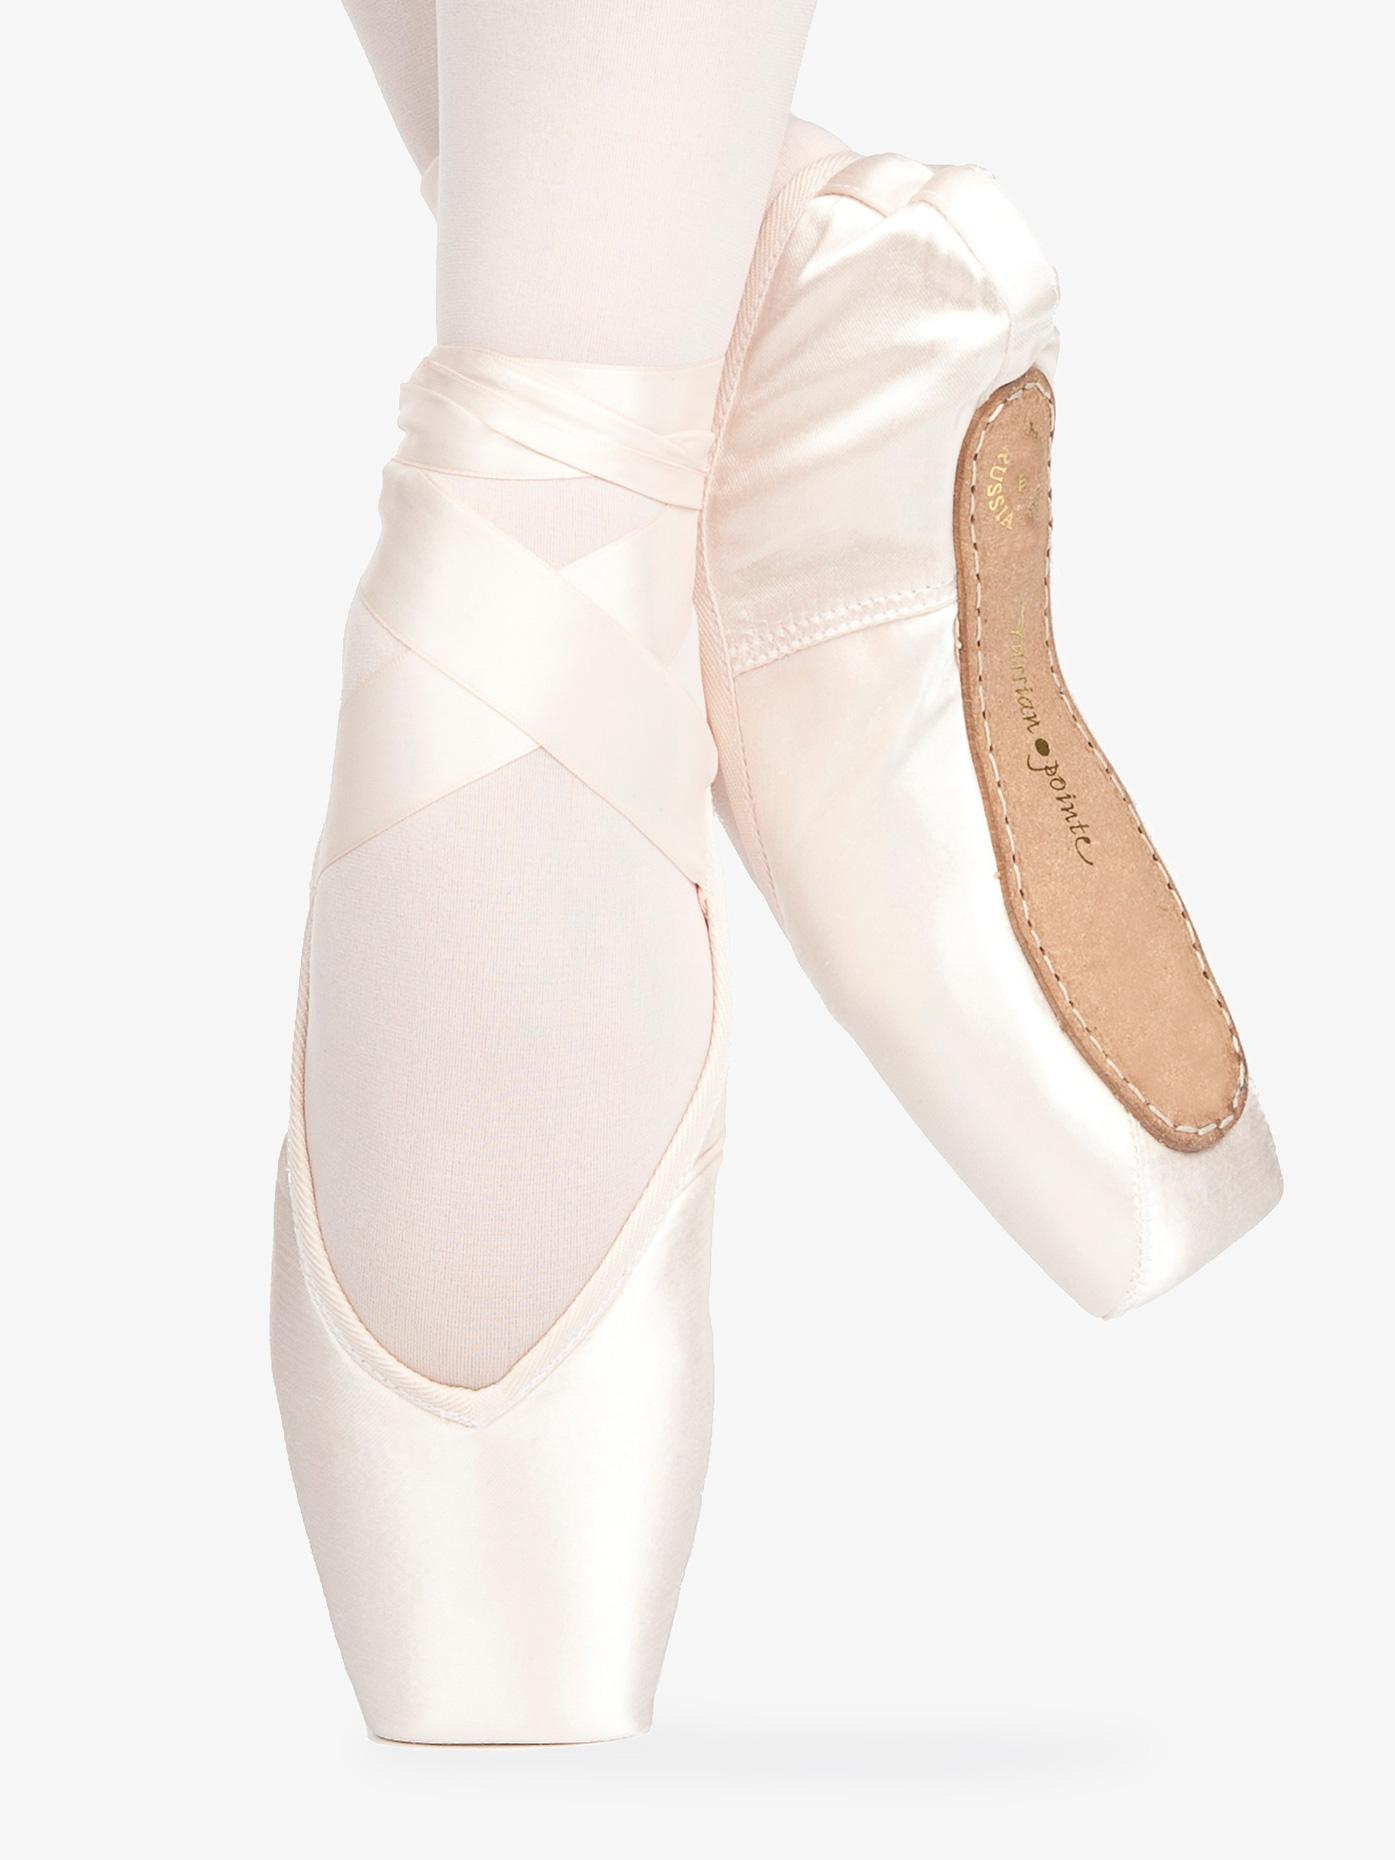 Russian Pointe Adult Rubin V-Cut Pointe Shoes RN